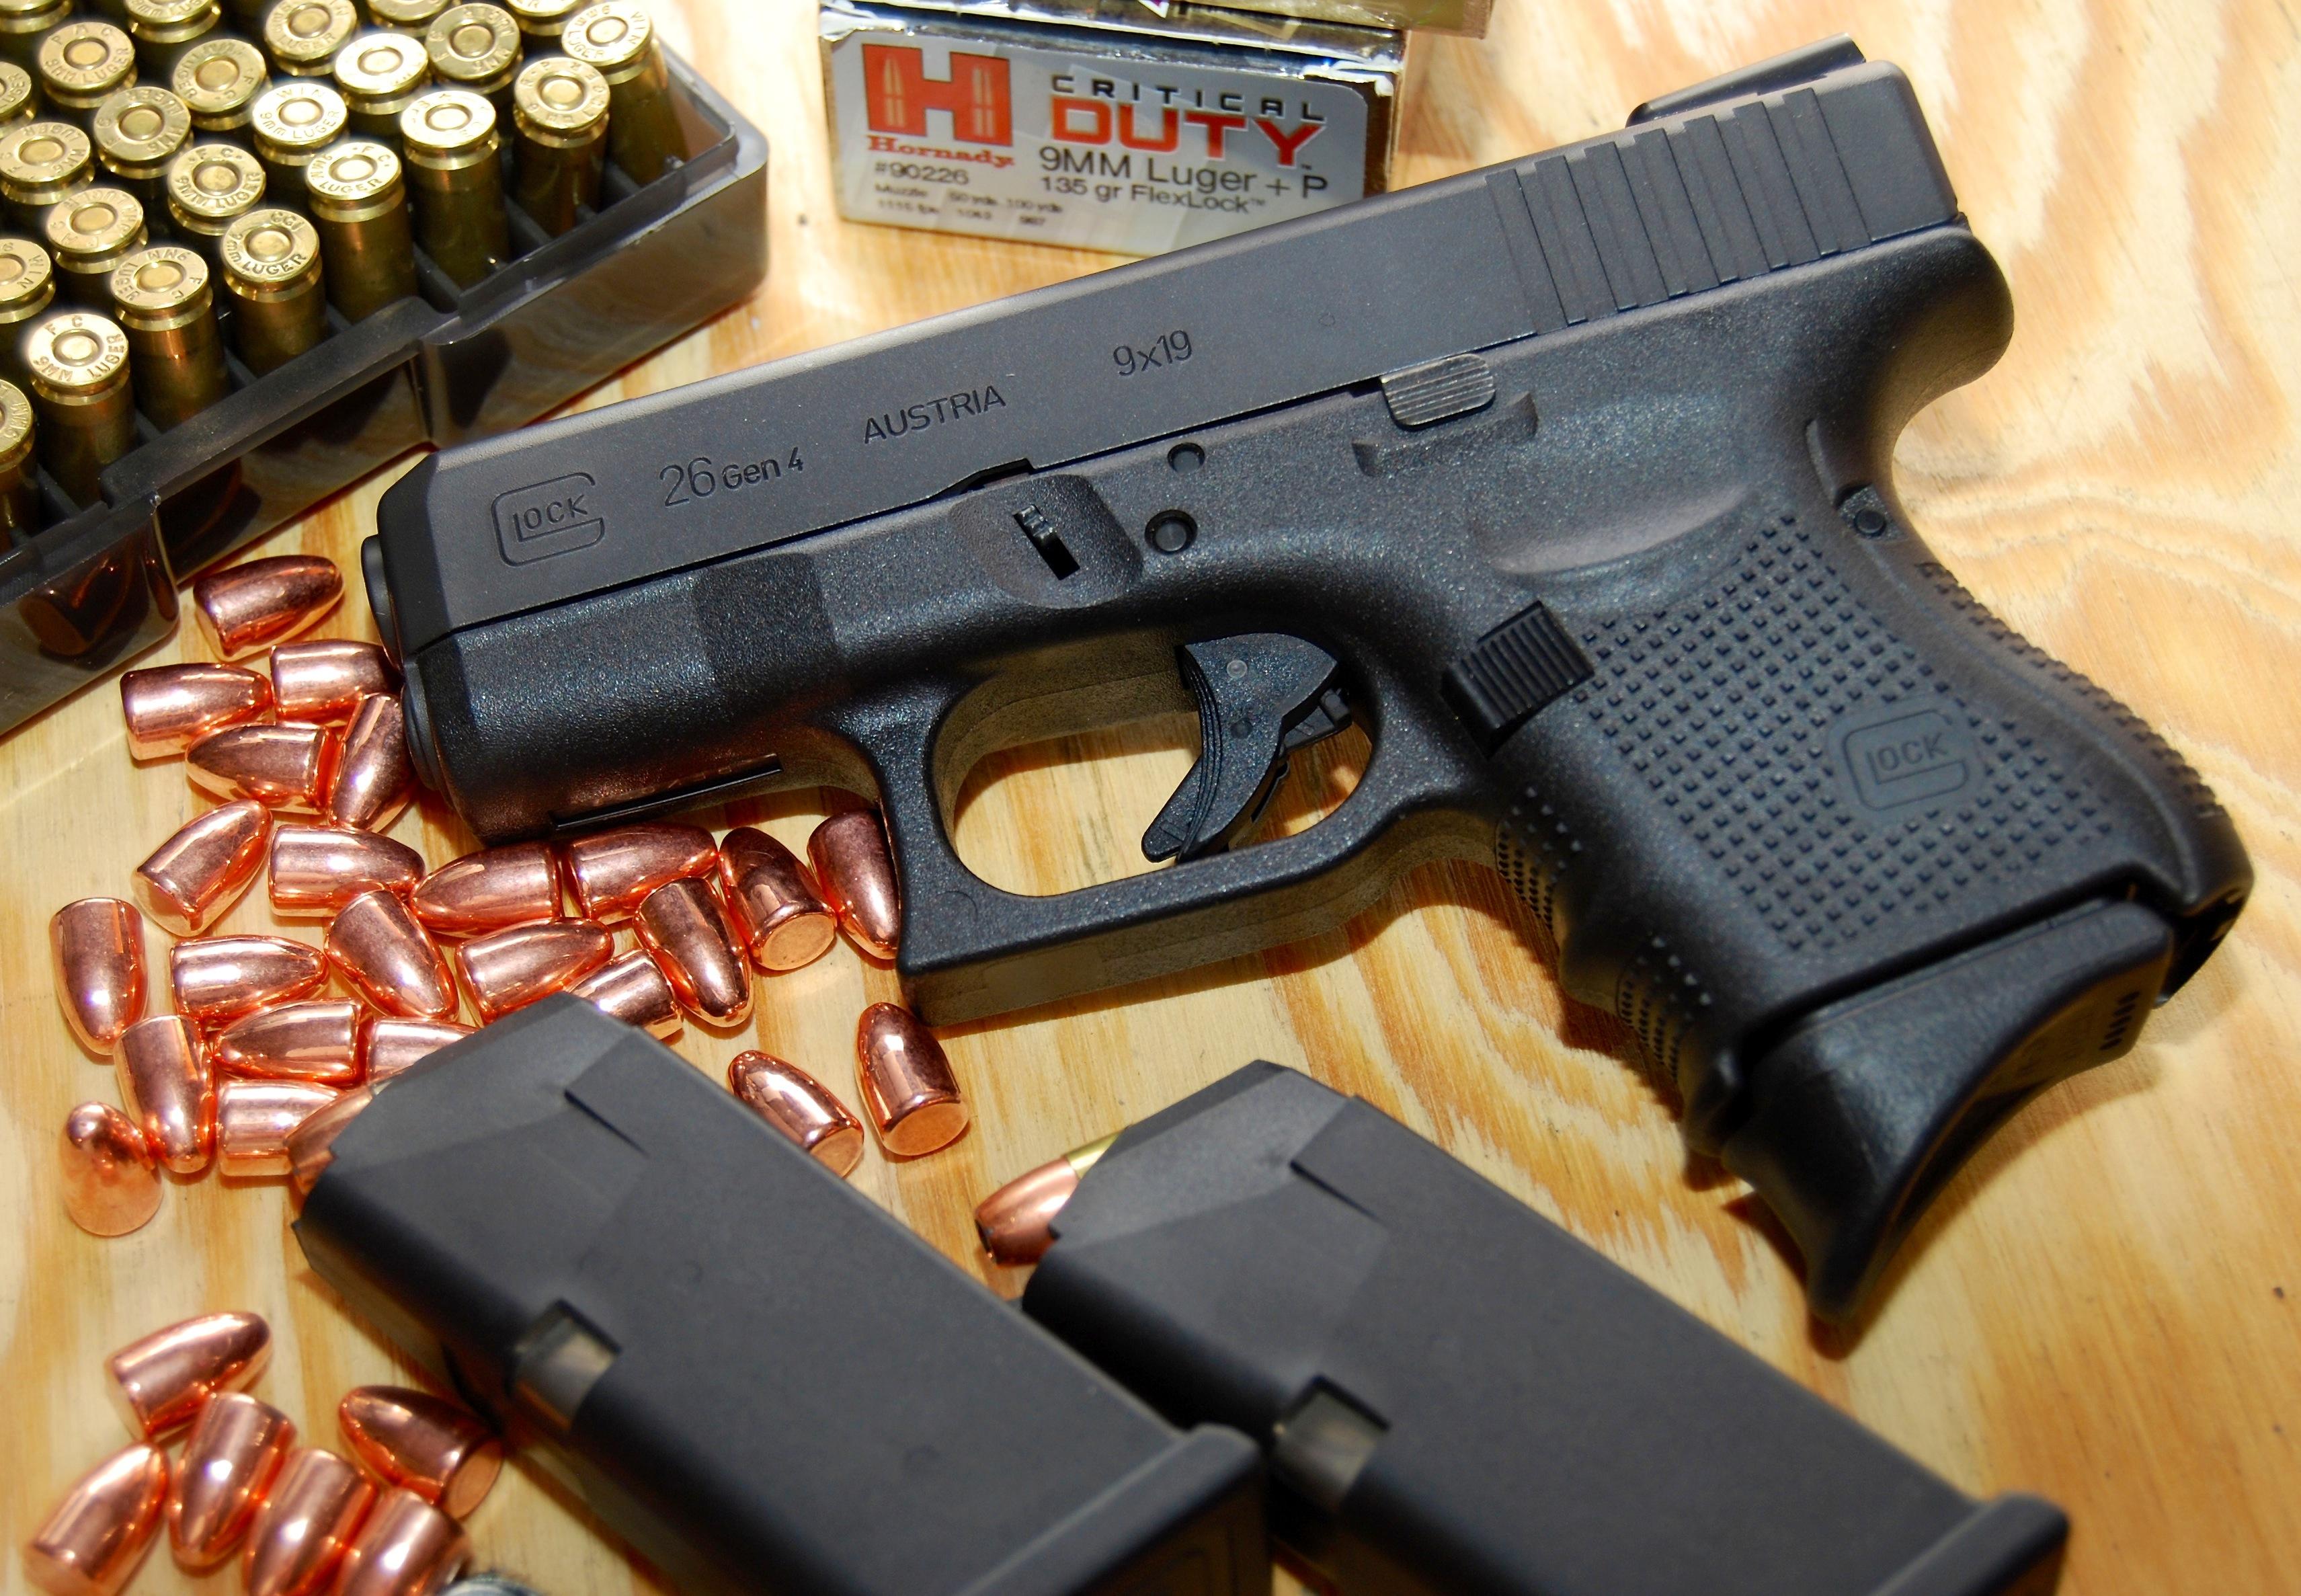 Gun Review: Gaston's G.I.L.F. - The Glock 26 Gen 4 ...